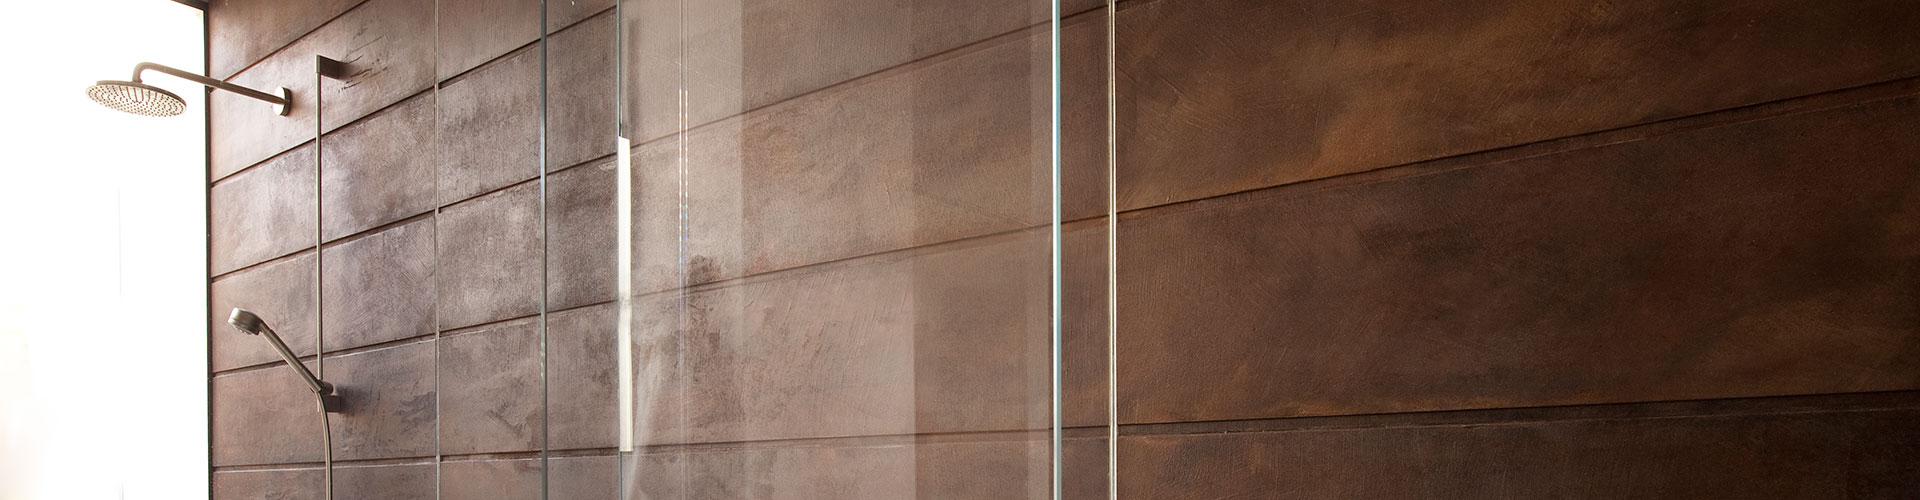 Microtopping wall by BETONADA 1 - לוחות בטון אדריכלי